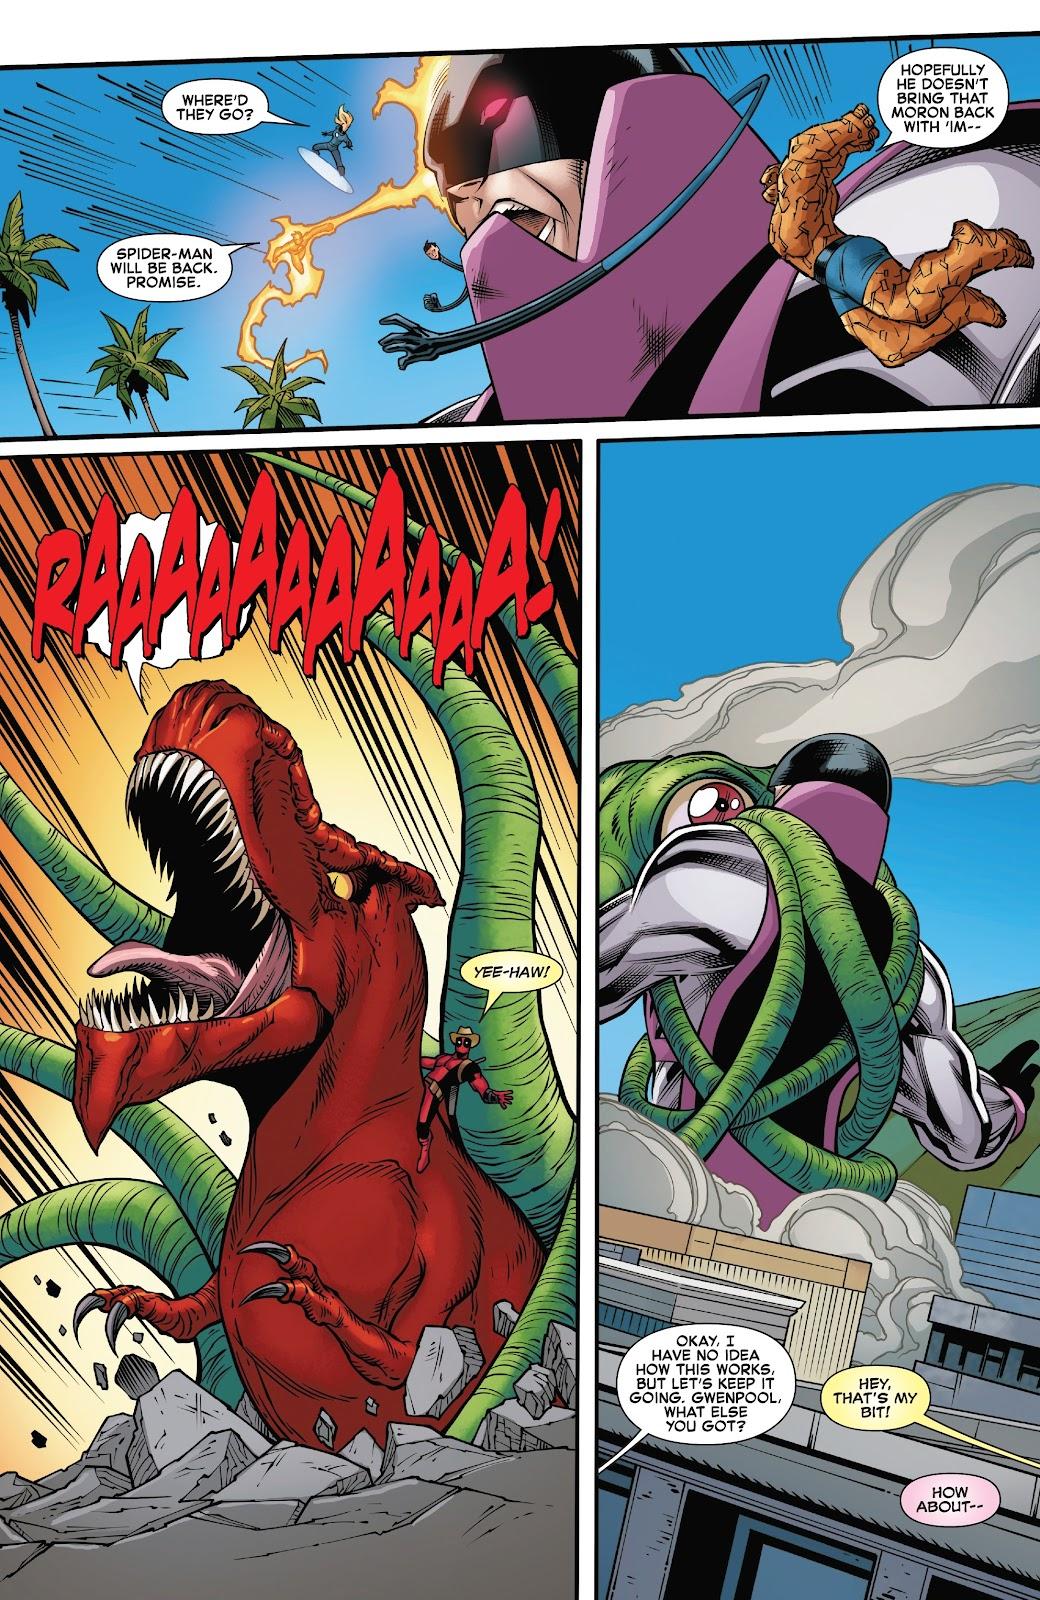 Read online Spider-Man/Deadpool comic -  Issue #50 - 13